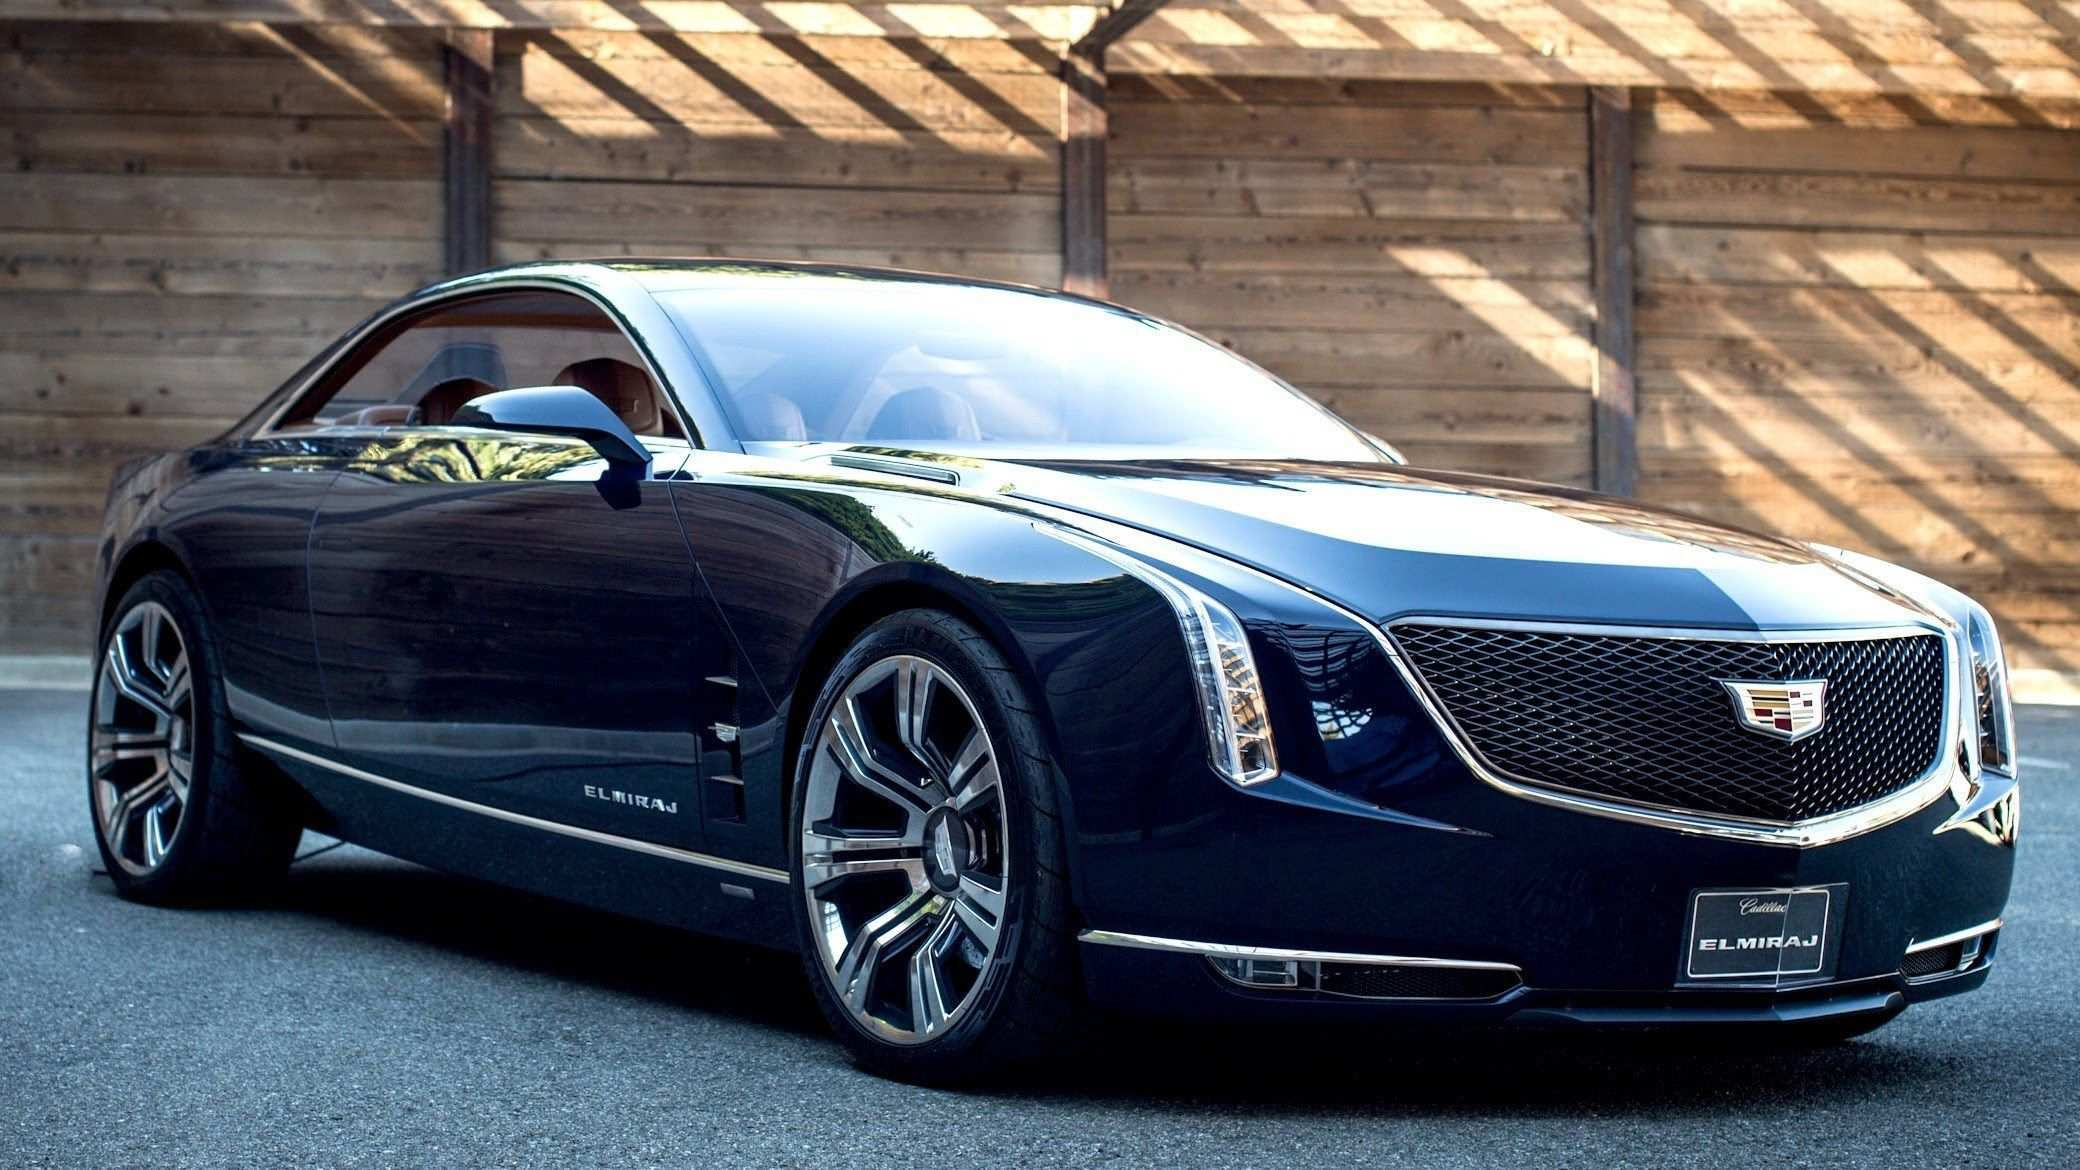 59 Great Elmiraj Cadillac Price Engine for Elmiraj Cadillac Price